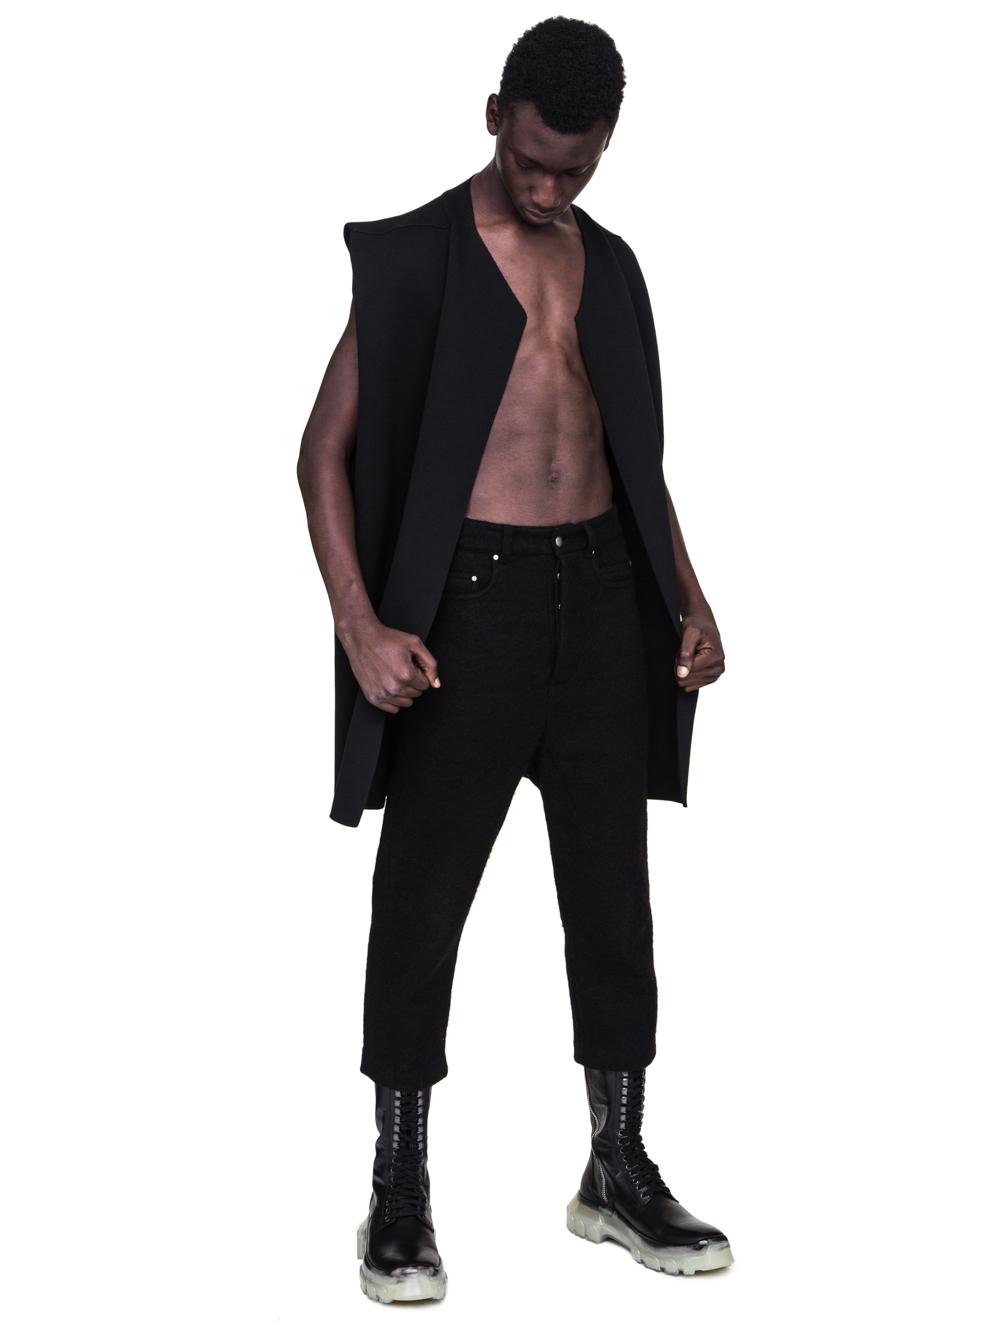 RICK OWENS FW18 SISYPHUS OFF-THE-RUNWAY SLEEVELESS TEE CARDIGAN IN BLACK